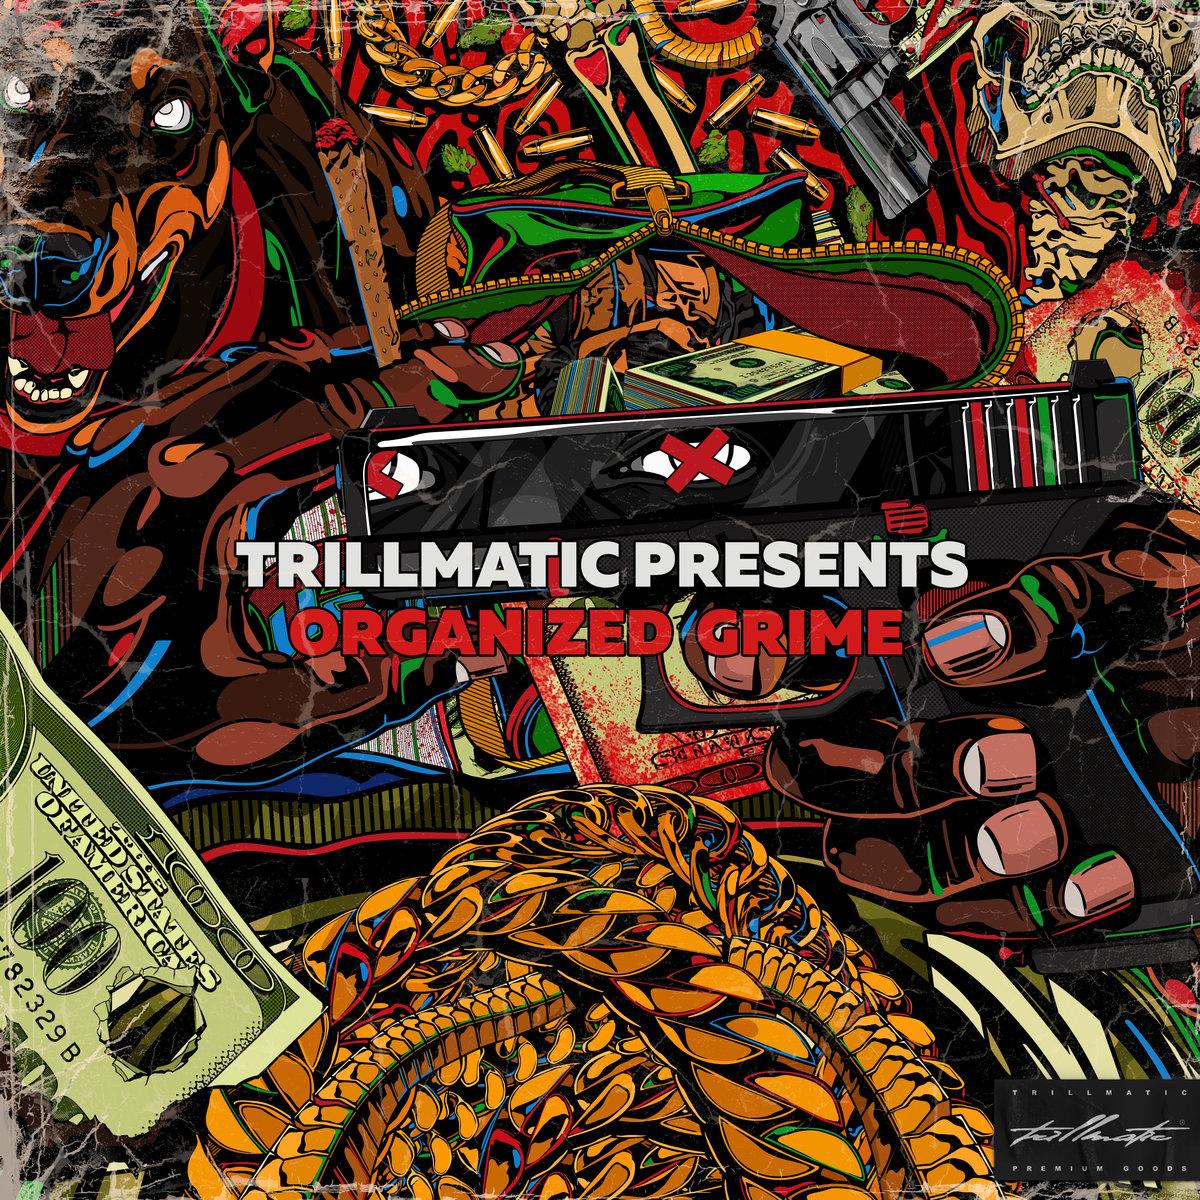 38e02eac7cfe Trillmatic & Conway The Machine - Organized Grime (Album Stream)